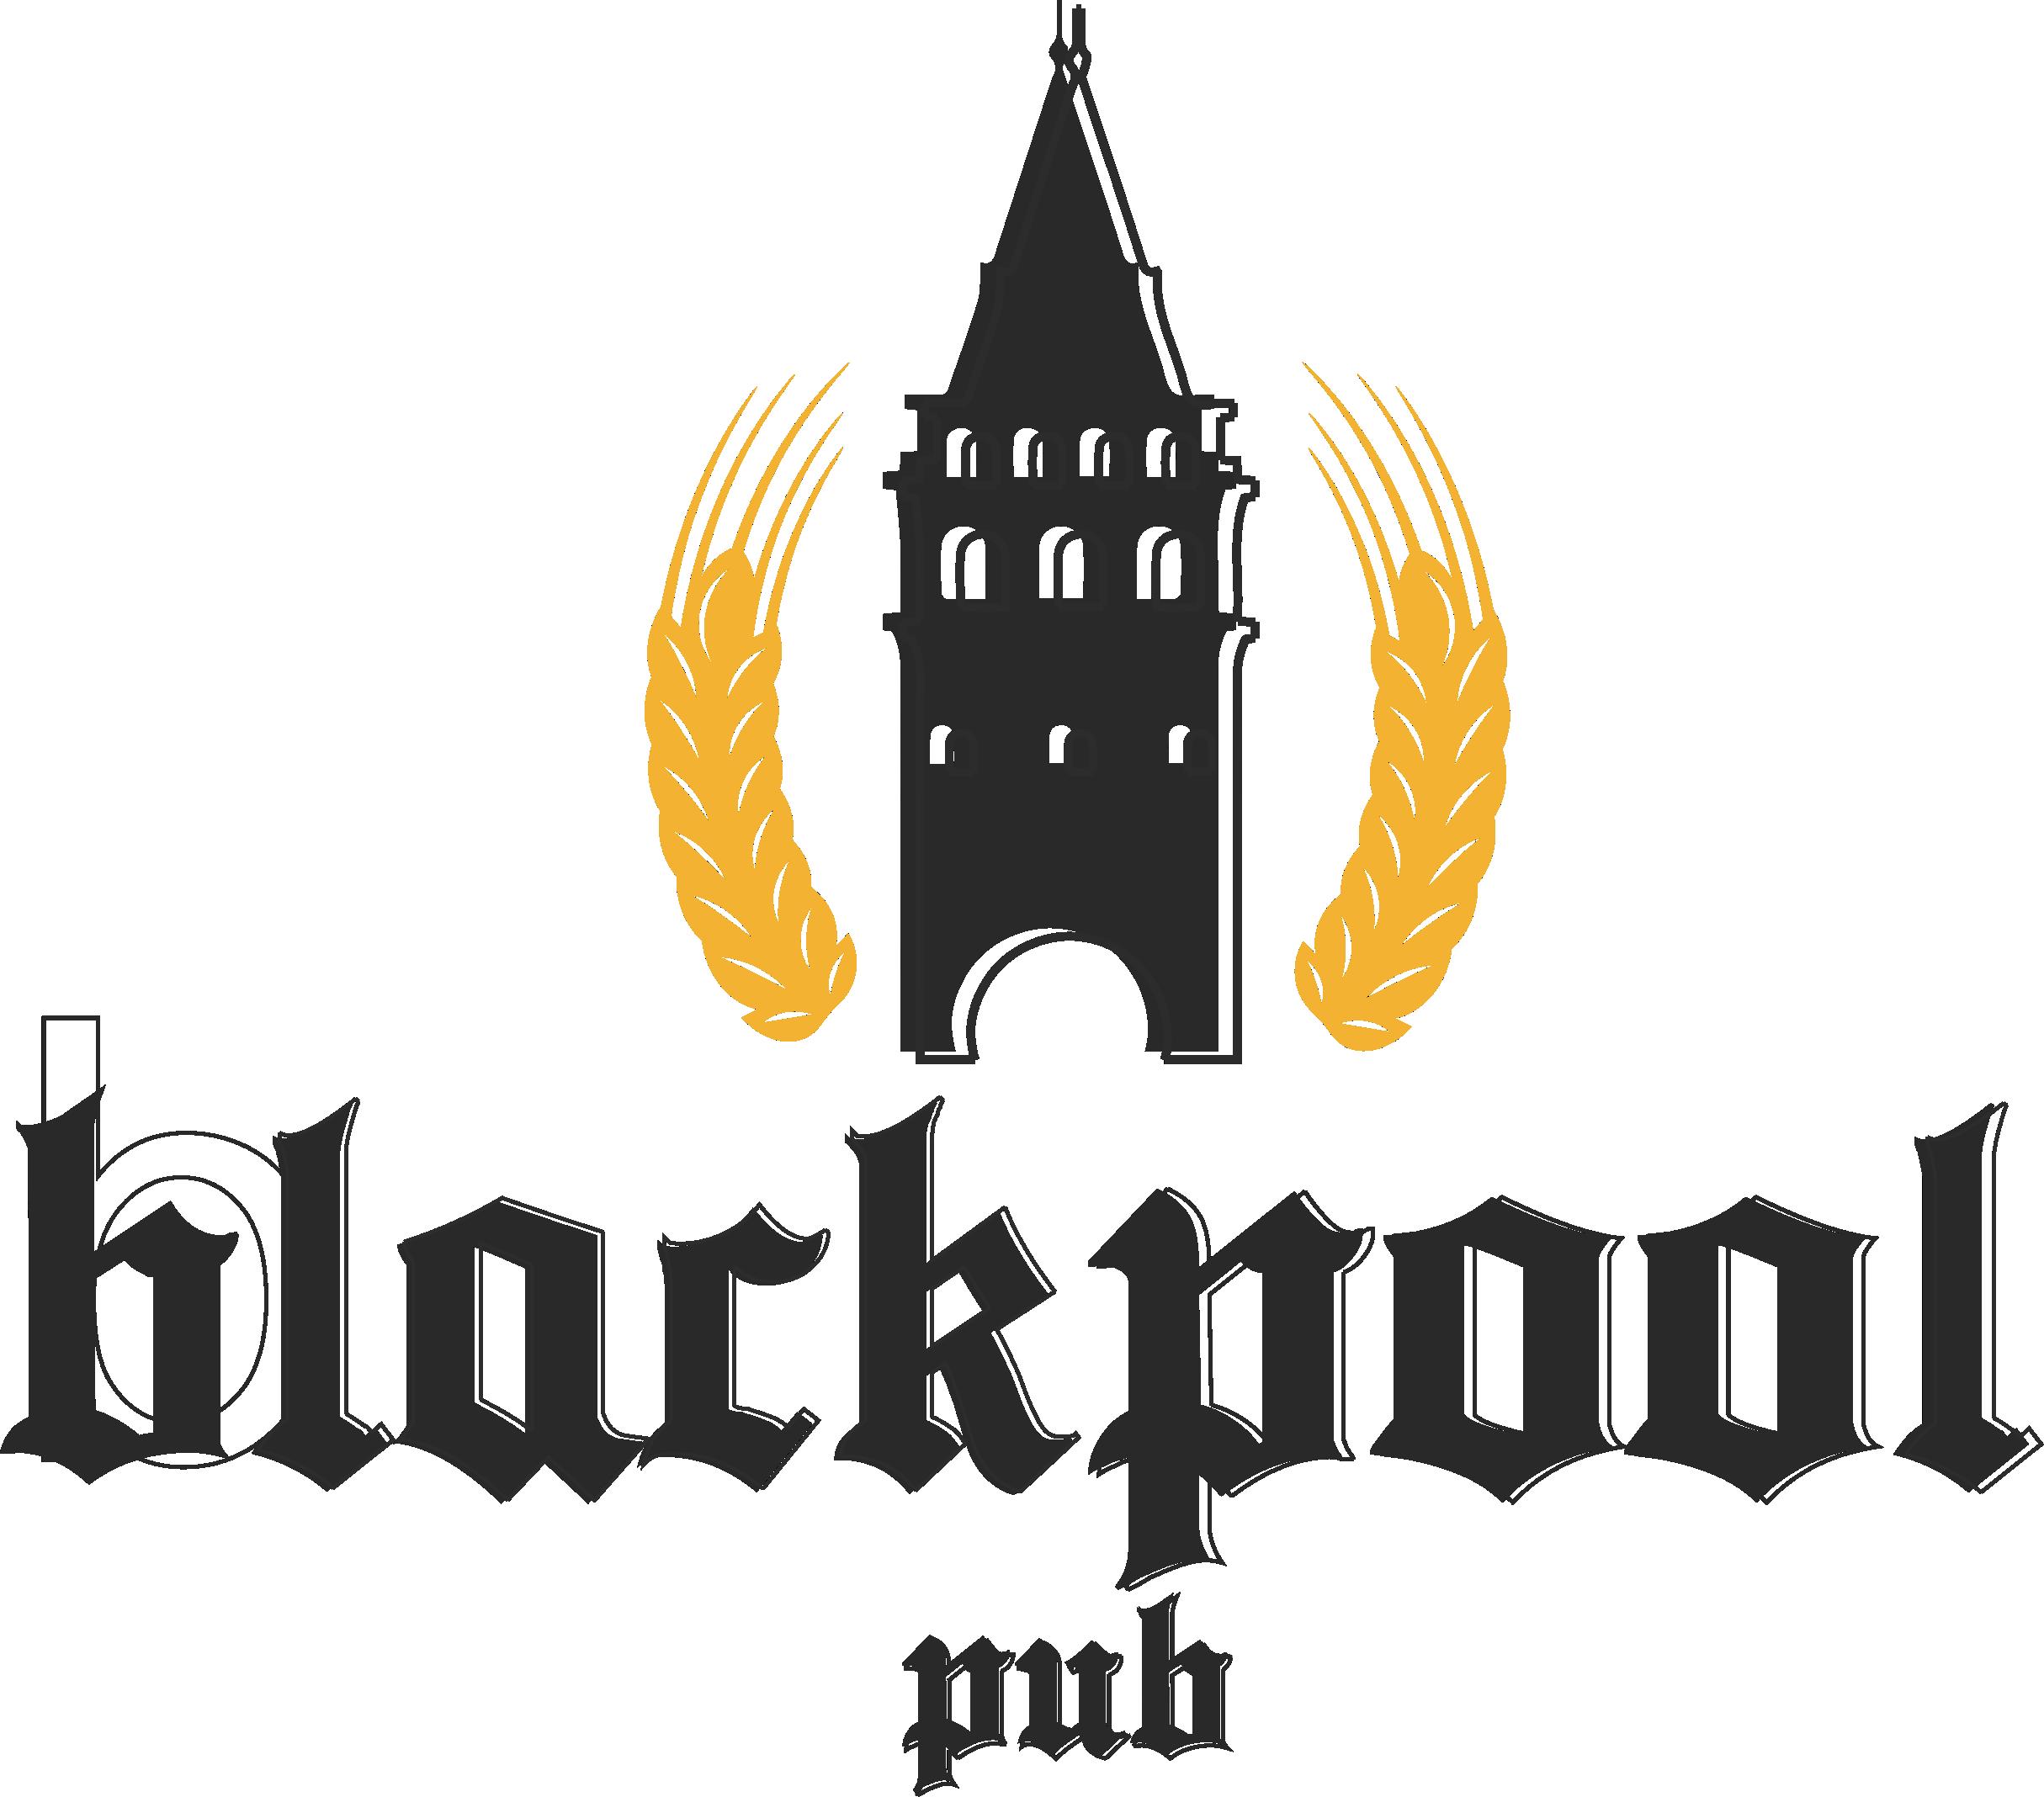 blackpool-pub-preto